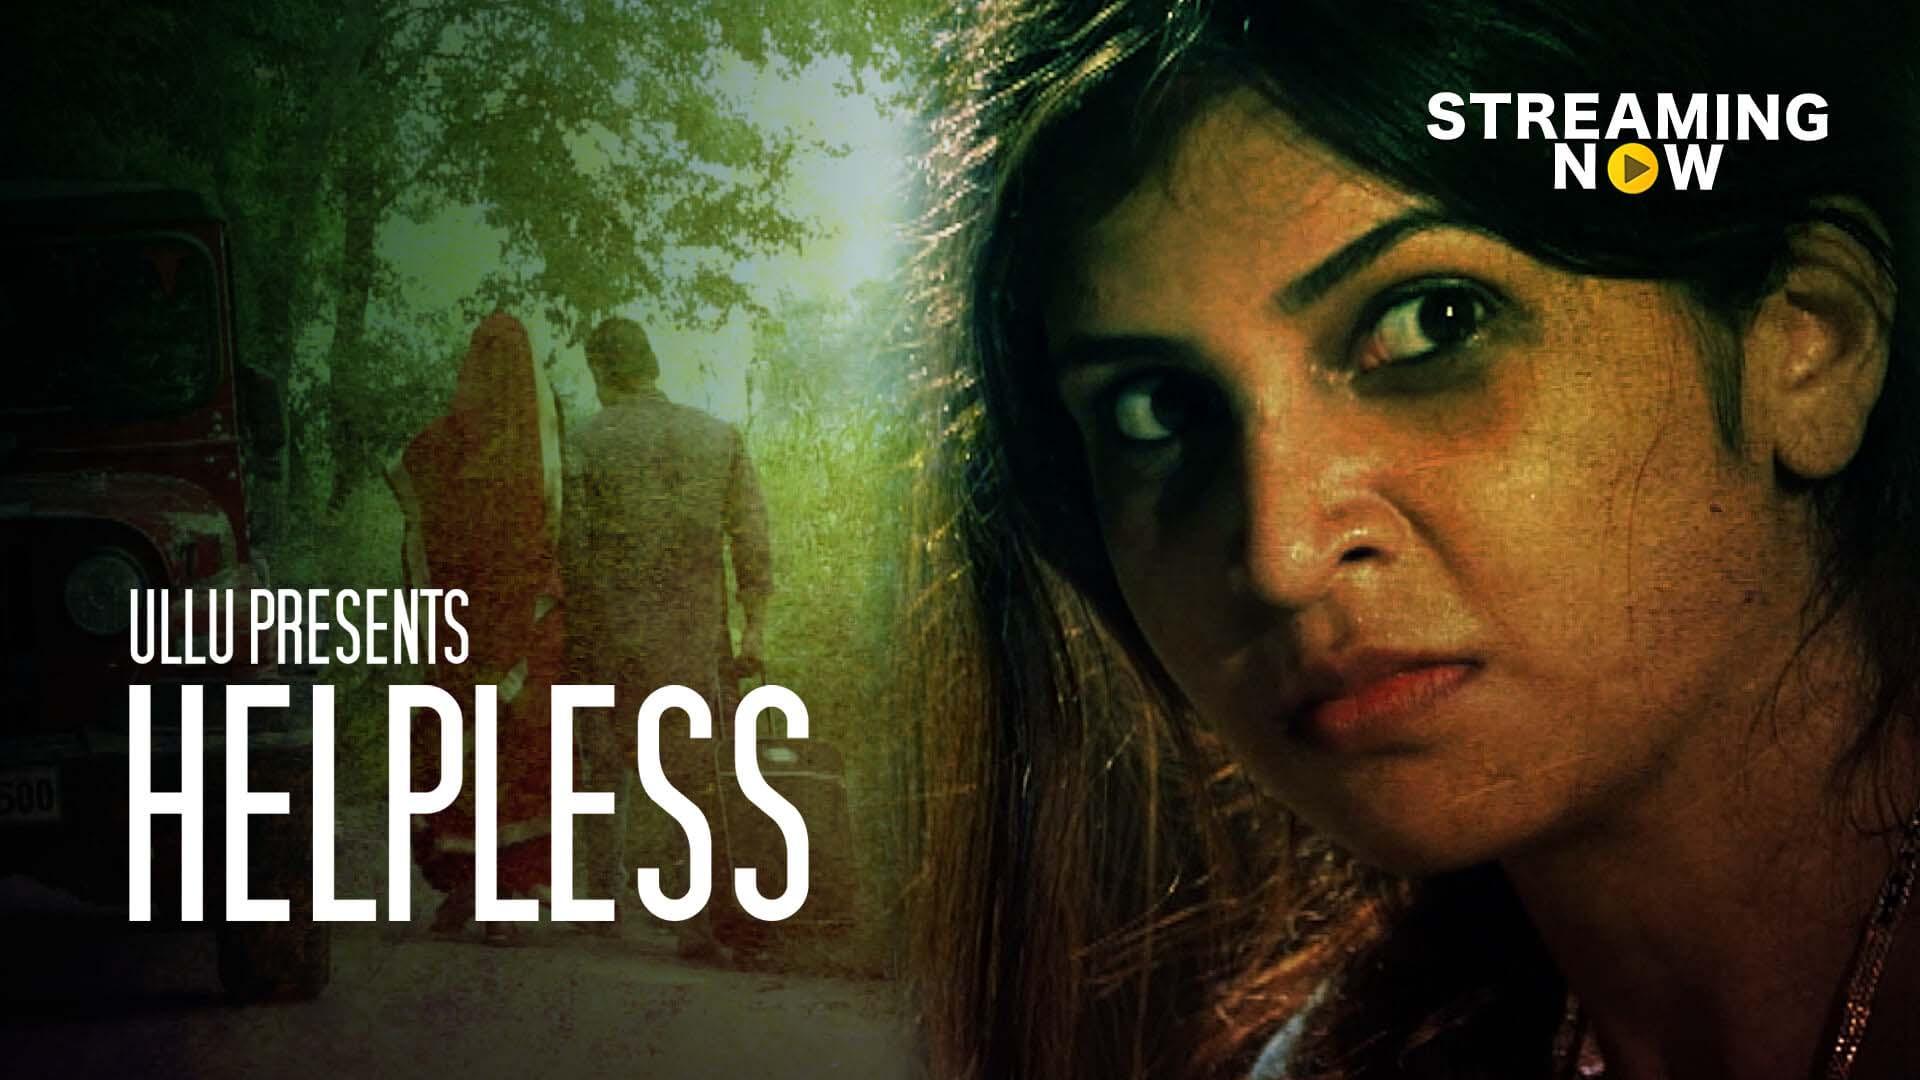 Helpless 2020 S01 banner